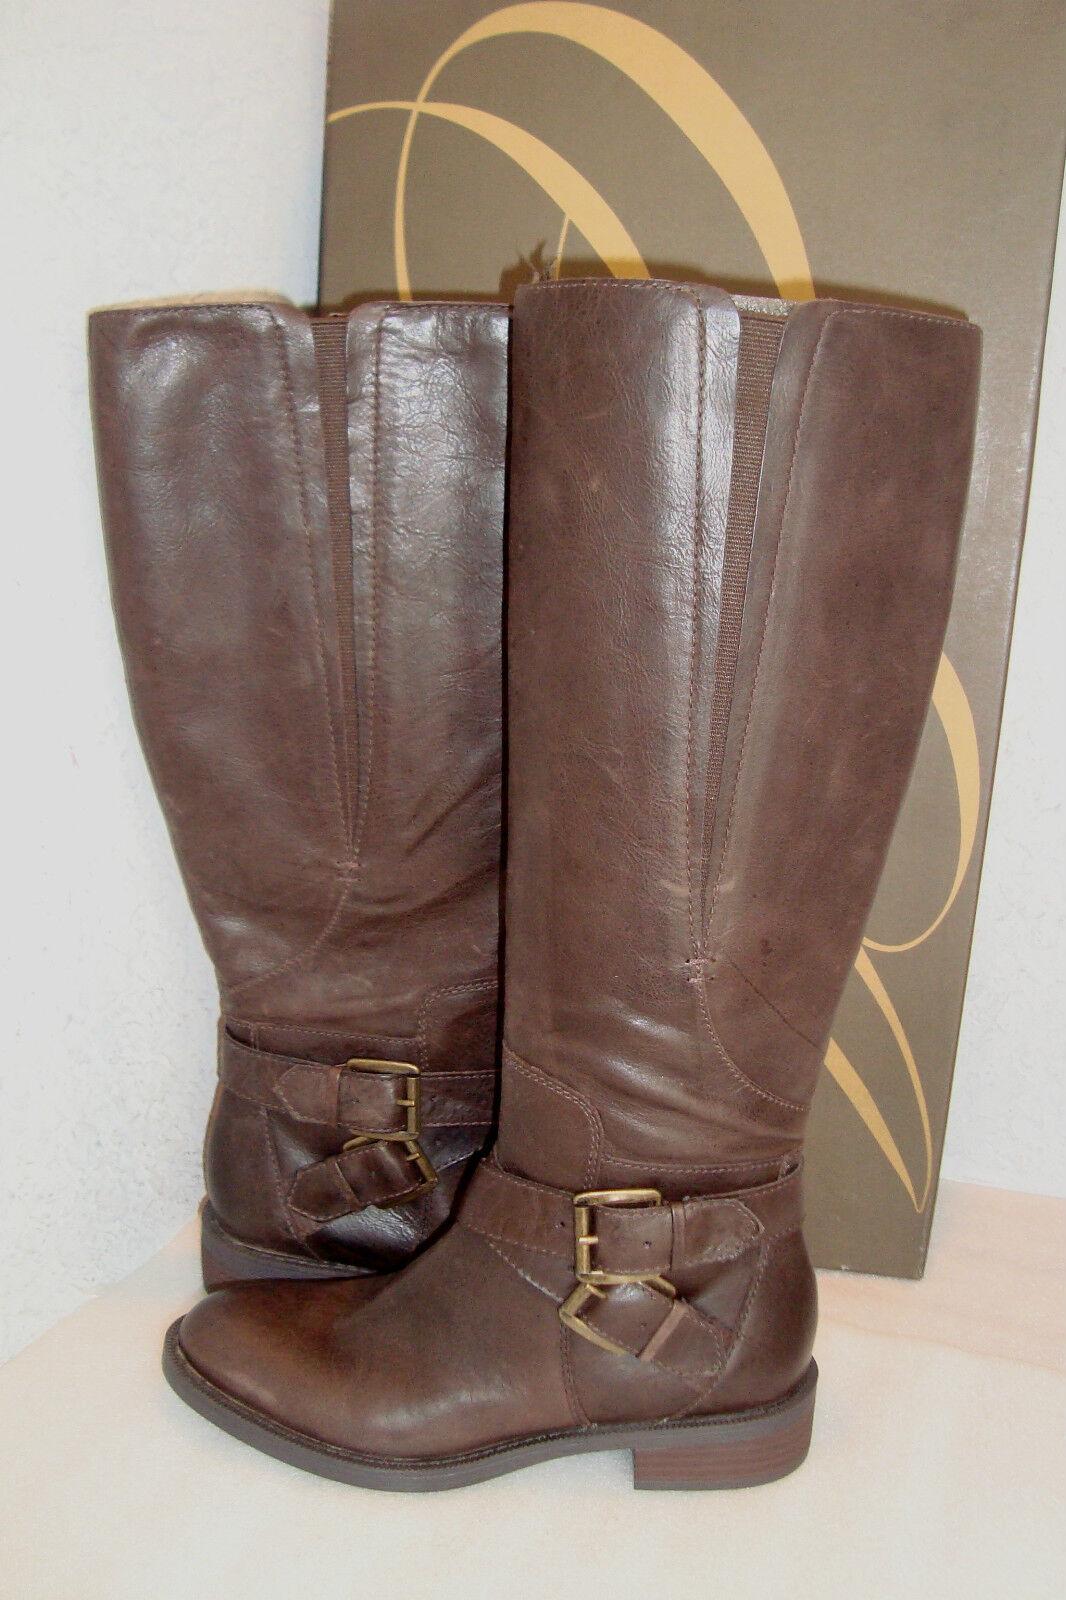 prezzi bassi di tutti i giorni Enzo Angiolini NWB NWB NWB donna Dark Marrone Sporty stivali scarpe 5.5 MED NEW  Felice shopping